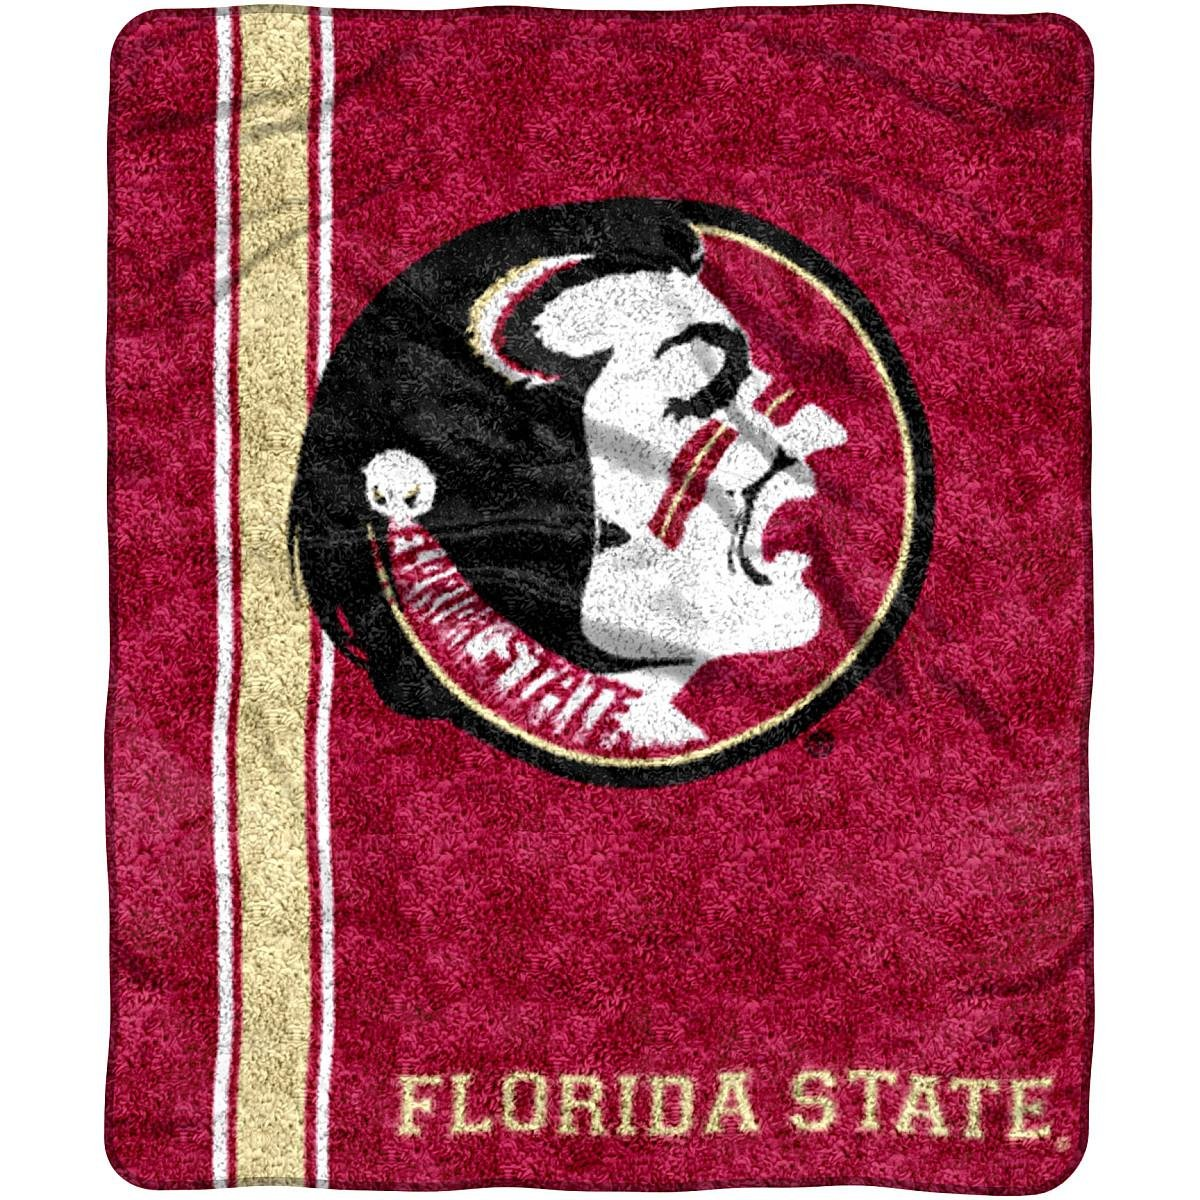 NCAA Florida State Seminoles ''Jersey'' Sherpa Throw Blanket, 50'' x 60''